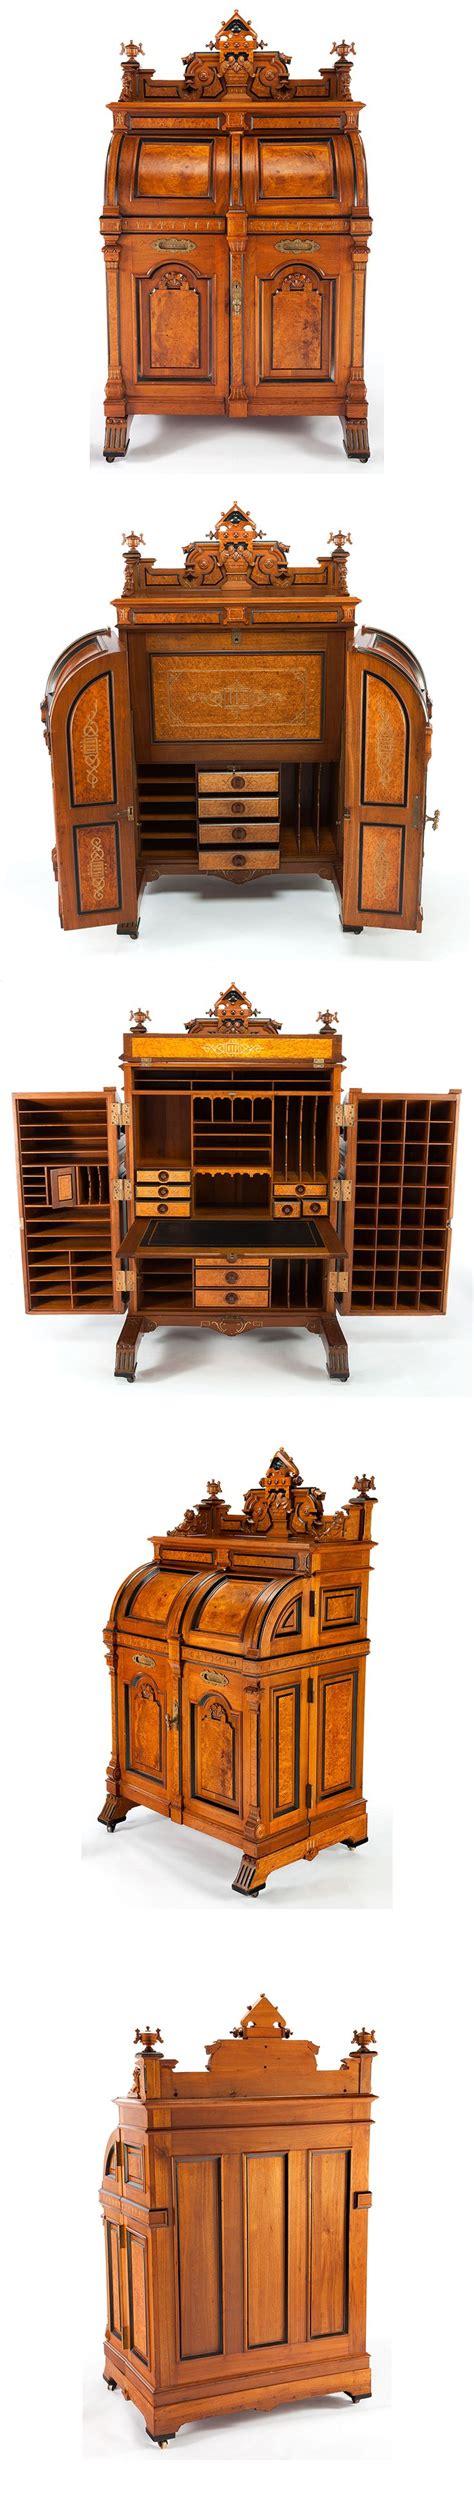 wood revival desk company 앤티크 가구에 관한 상위 25개 이상의 아이디어 골동품 원시적인 및